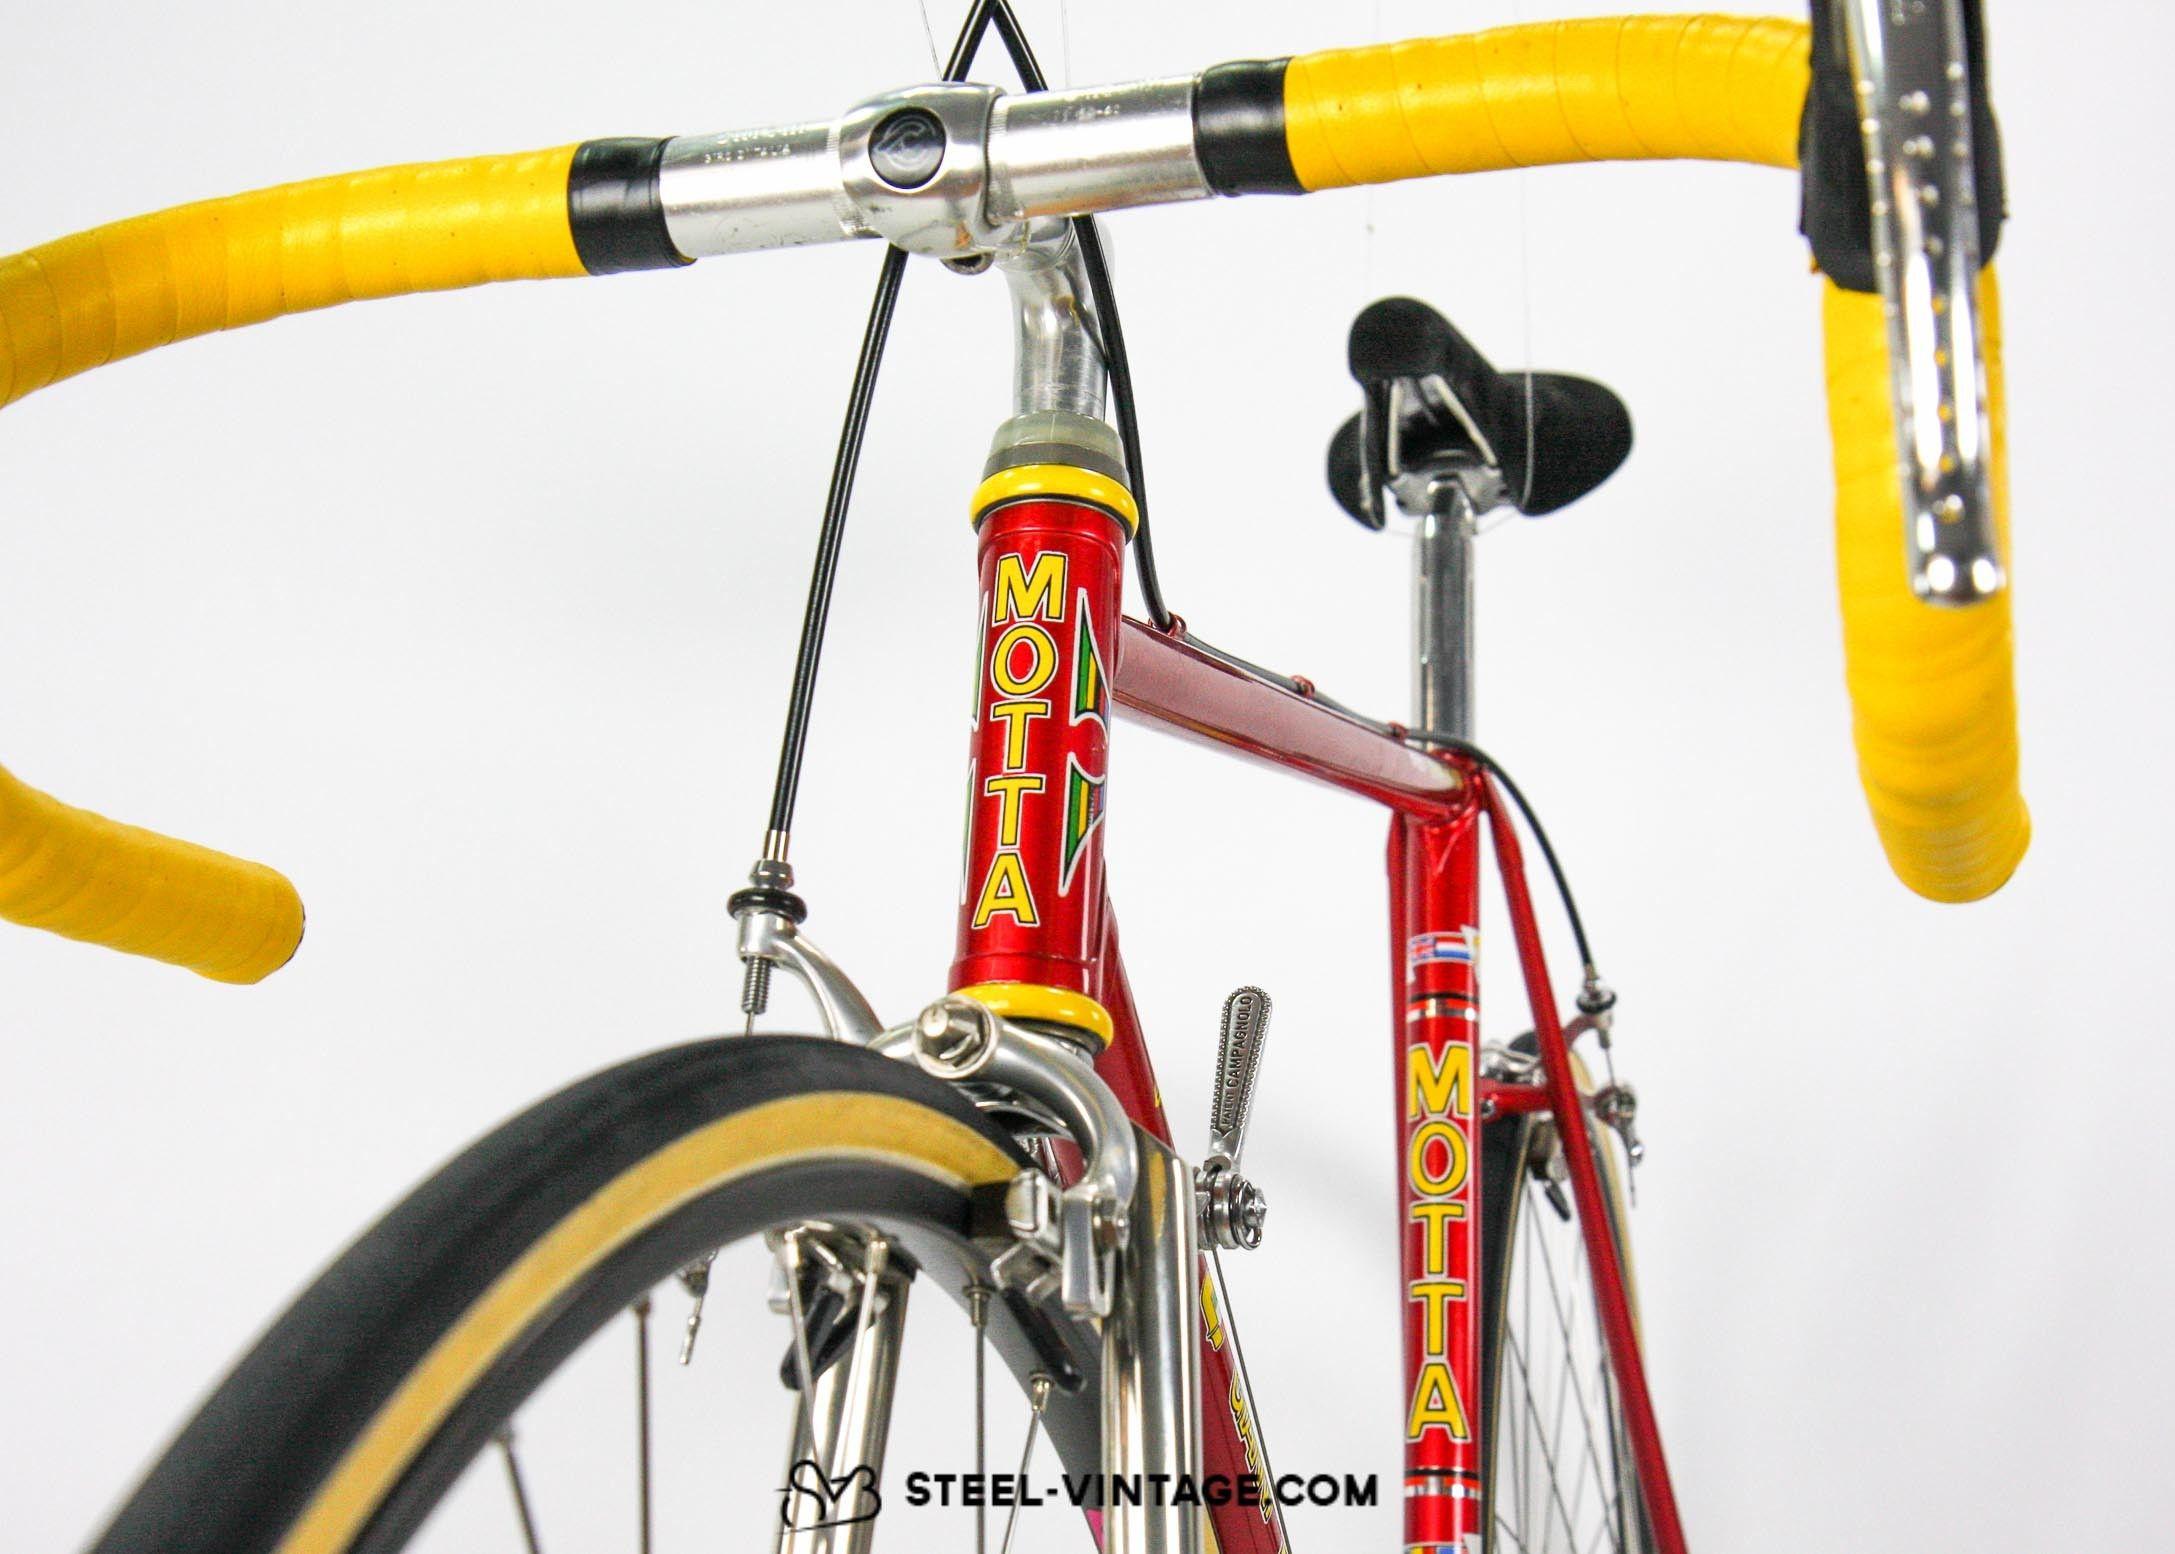 Steel Vintage Bikes Gianni Motta Personal Classic Racing Bike